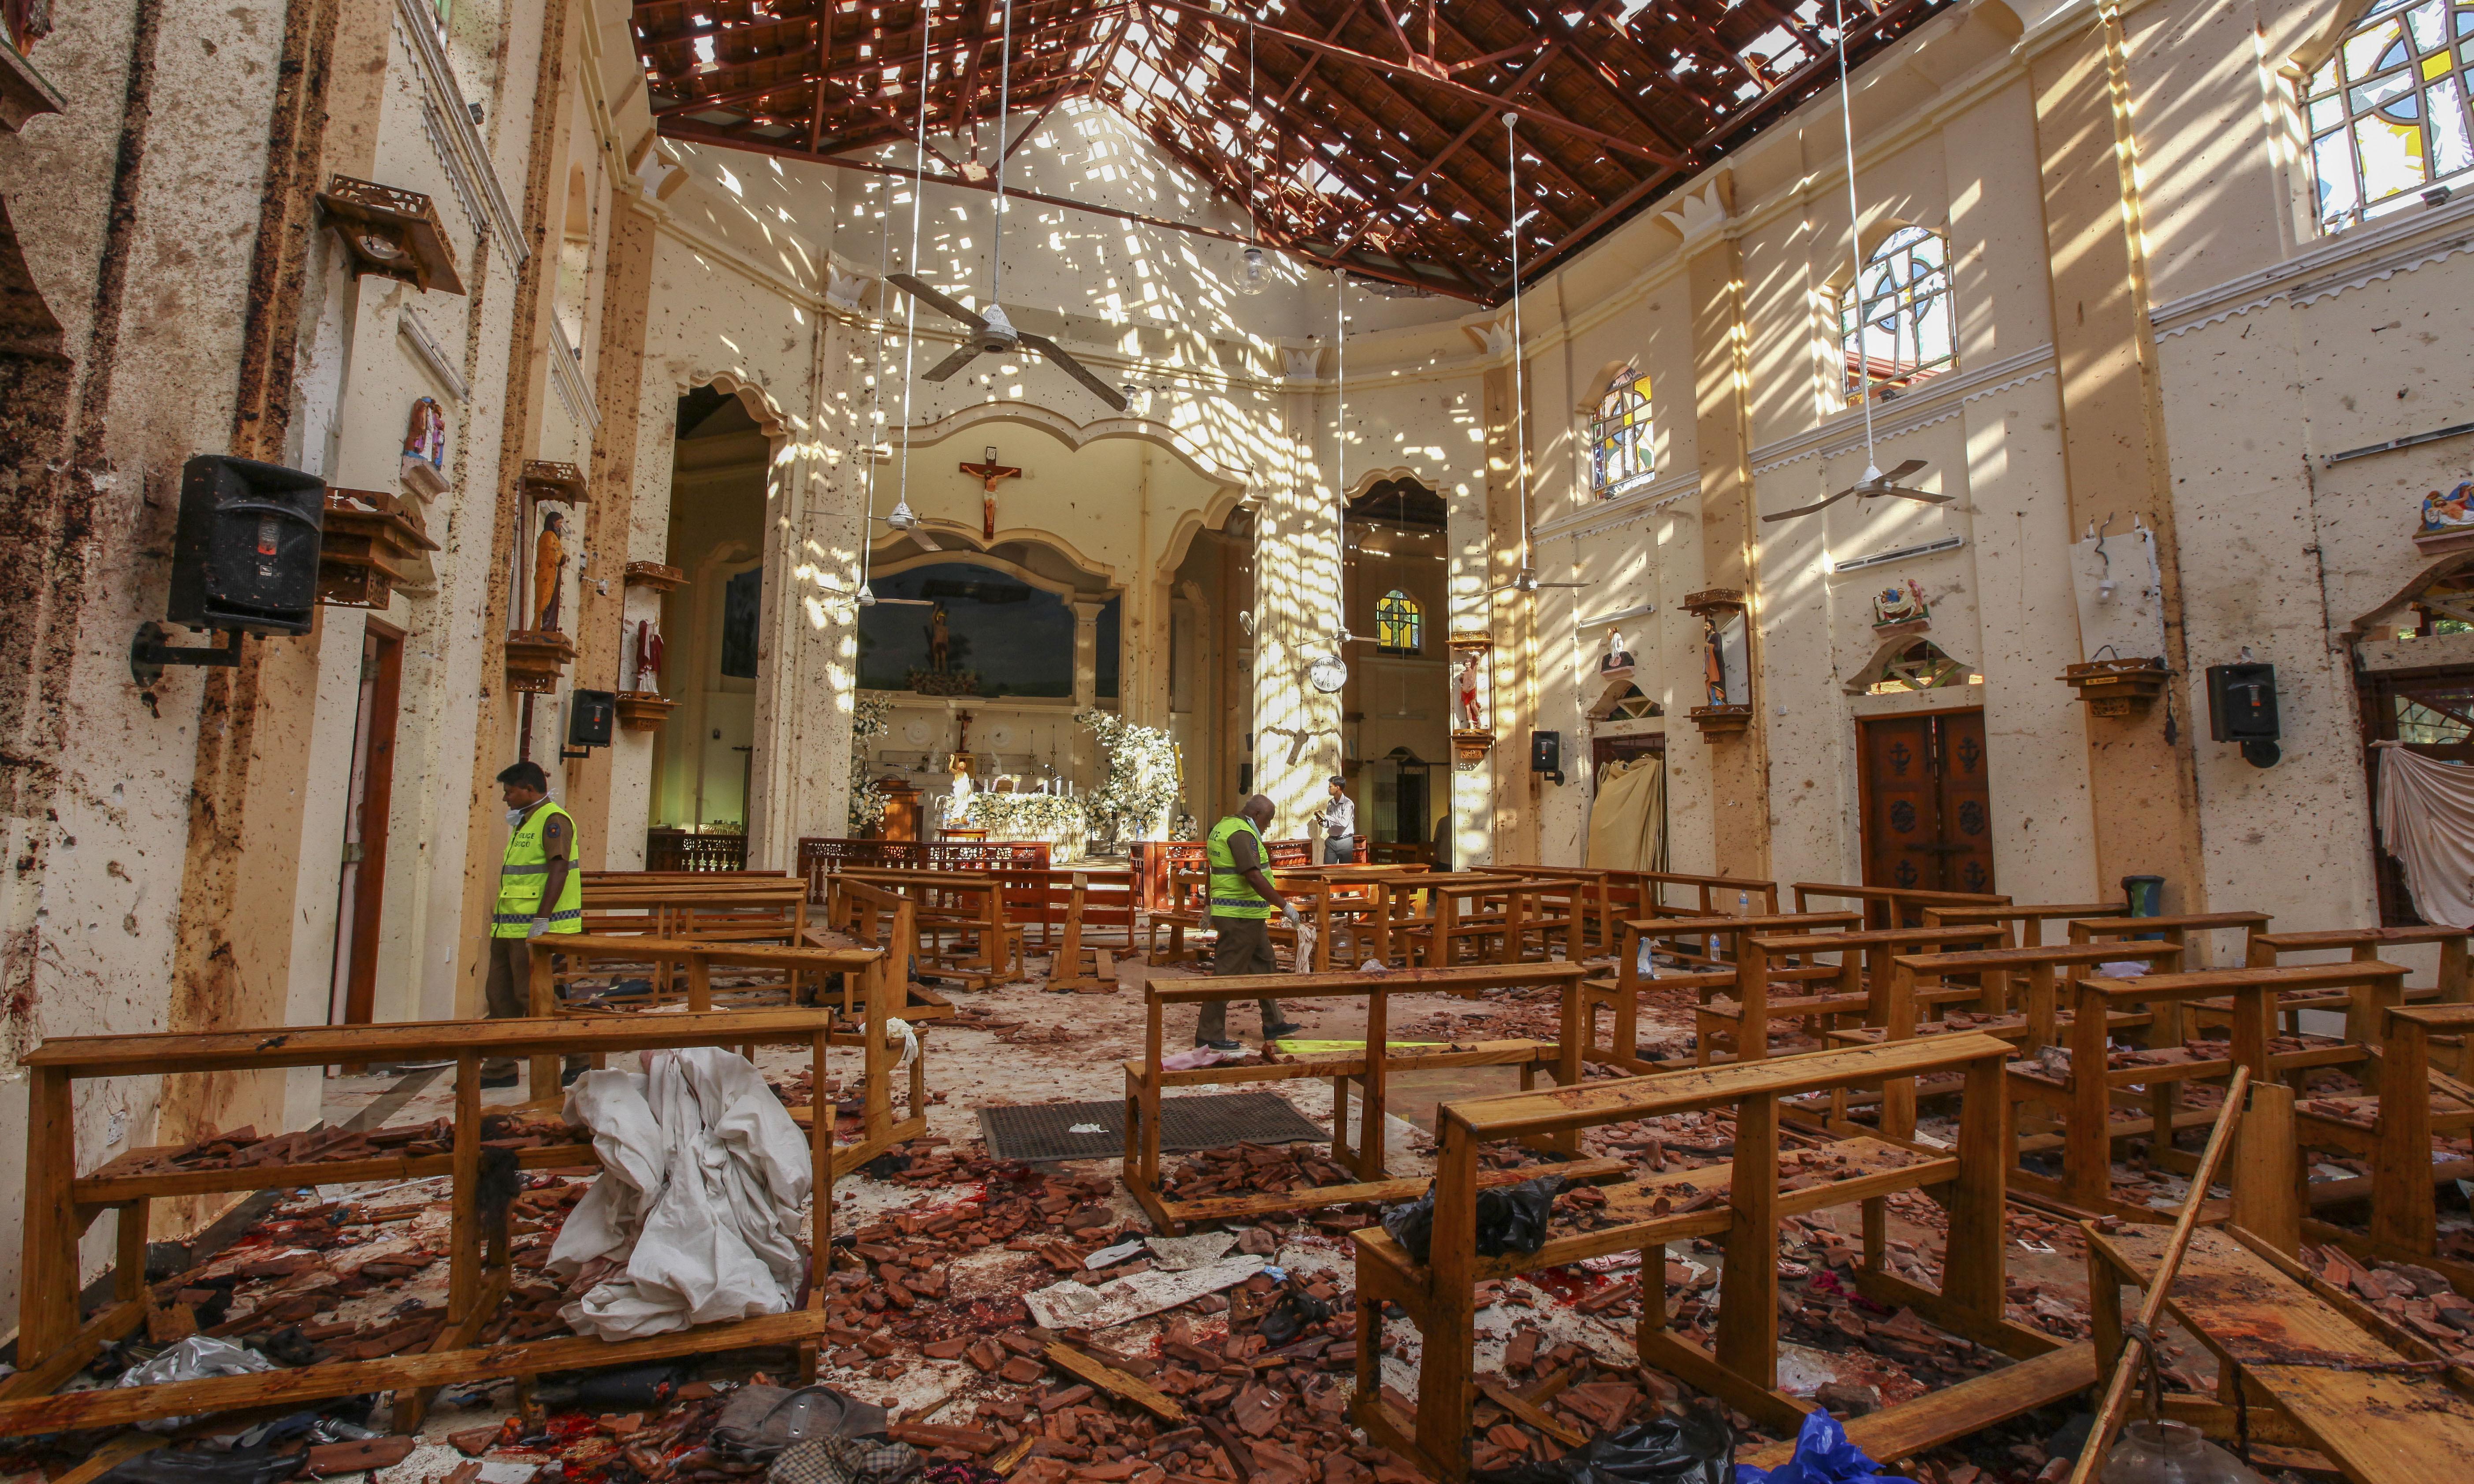 Mike Pompeo says 'several' US citizens killed in Sri Lanka attacks